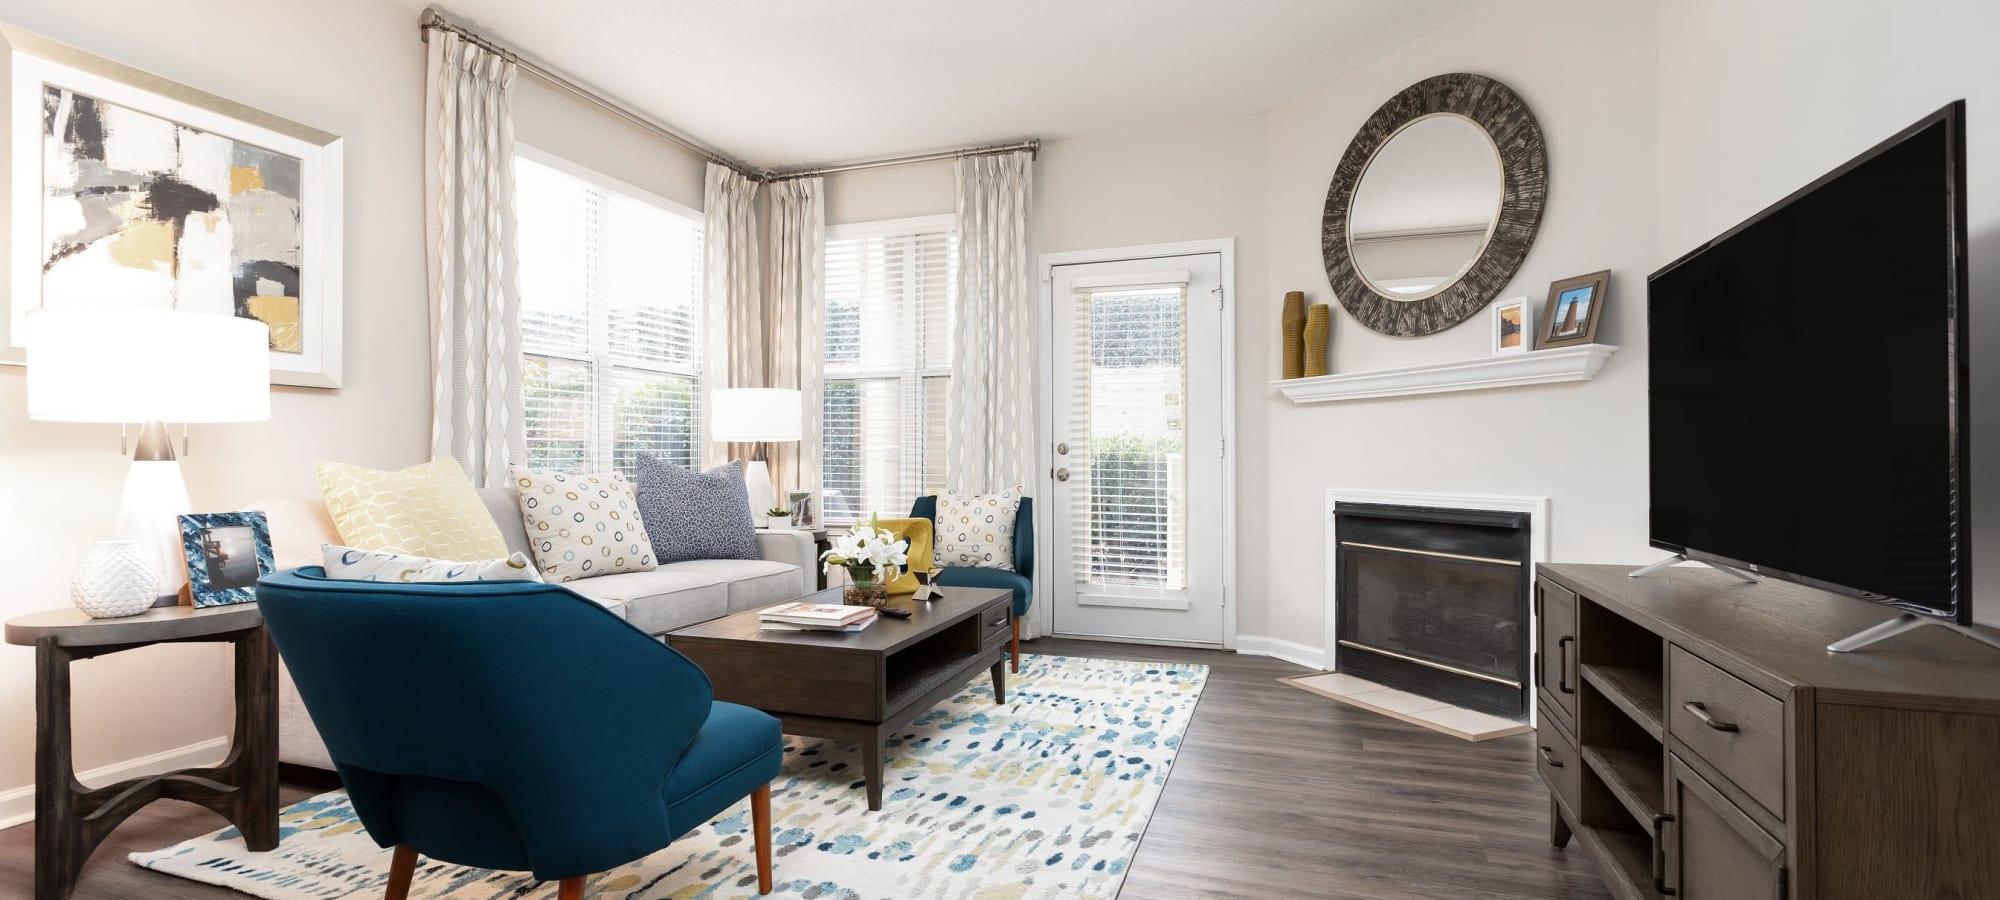 Apartments at 200 East in Durham, North Carolina